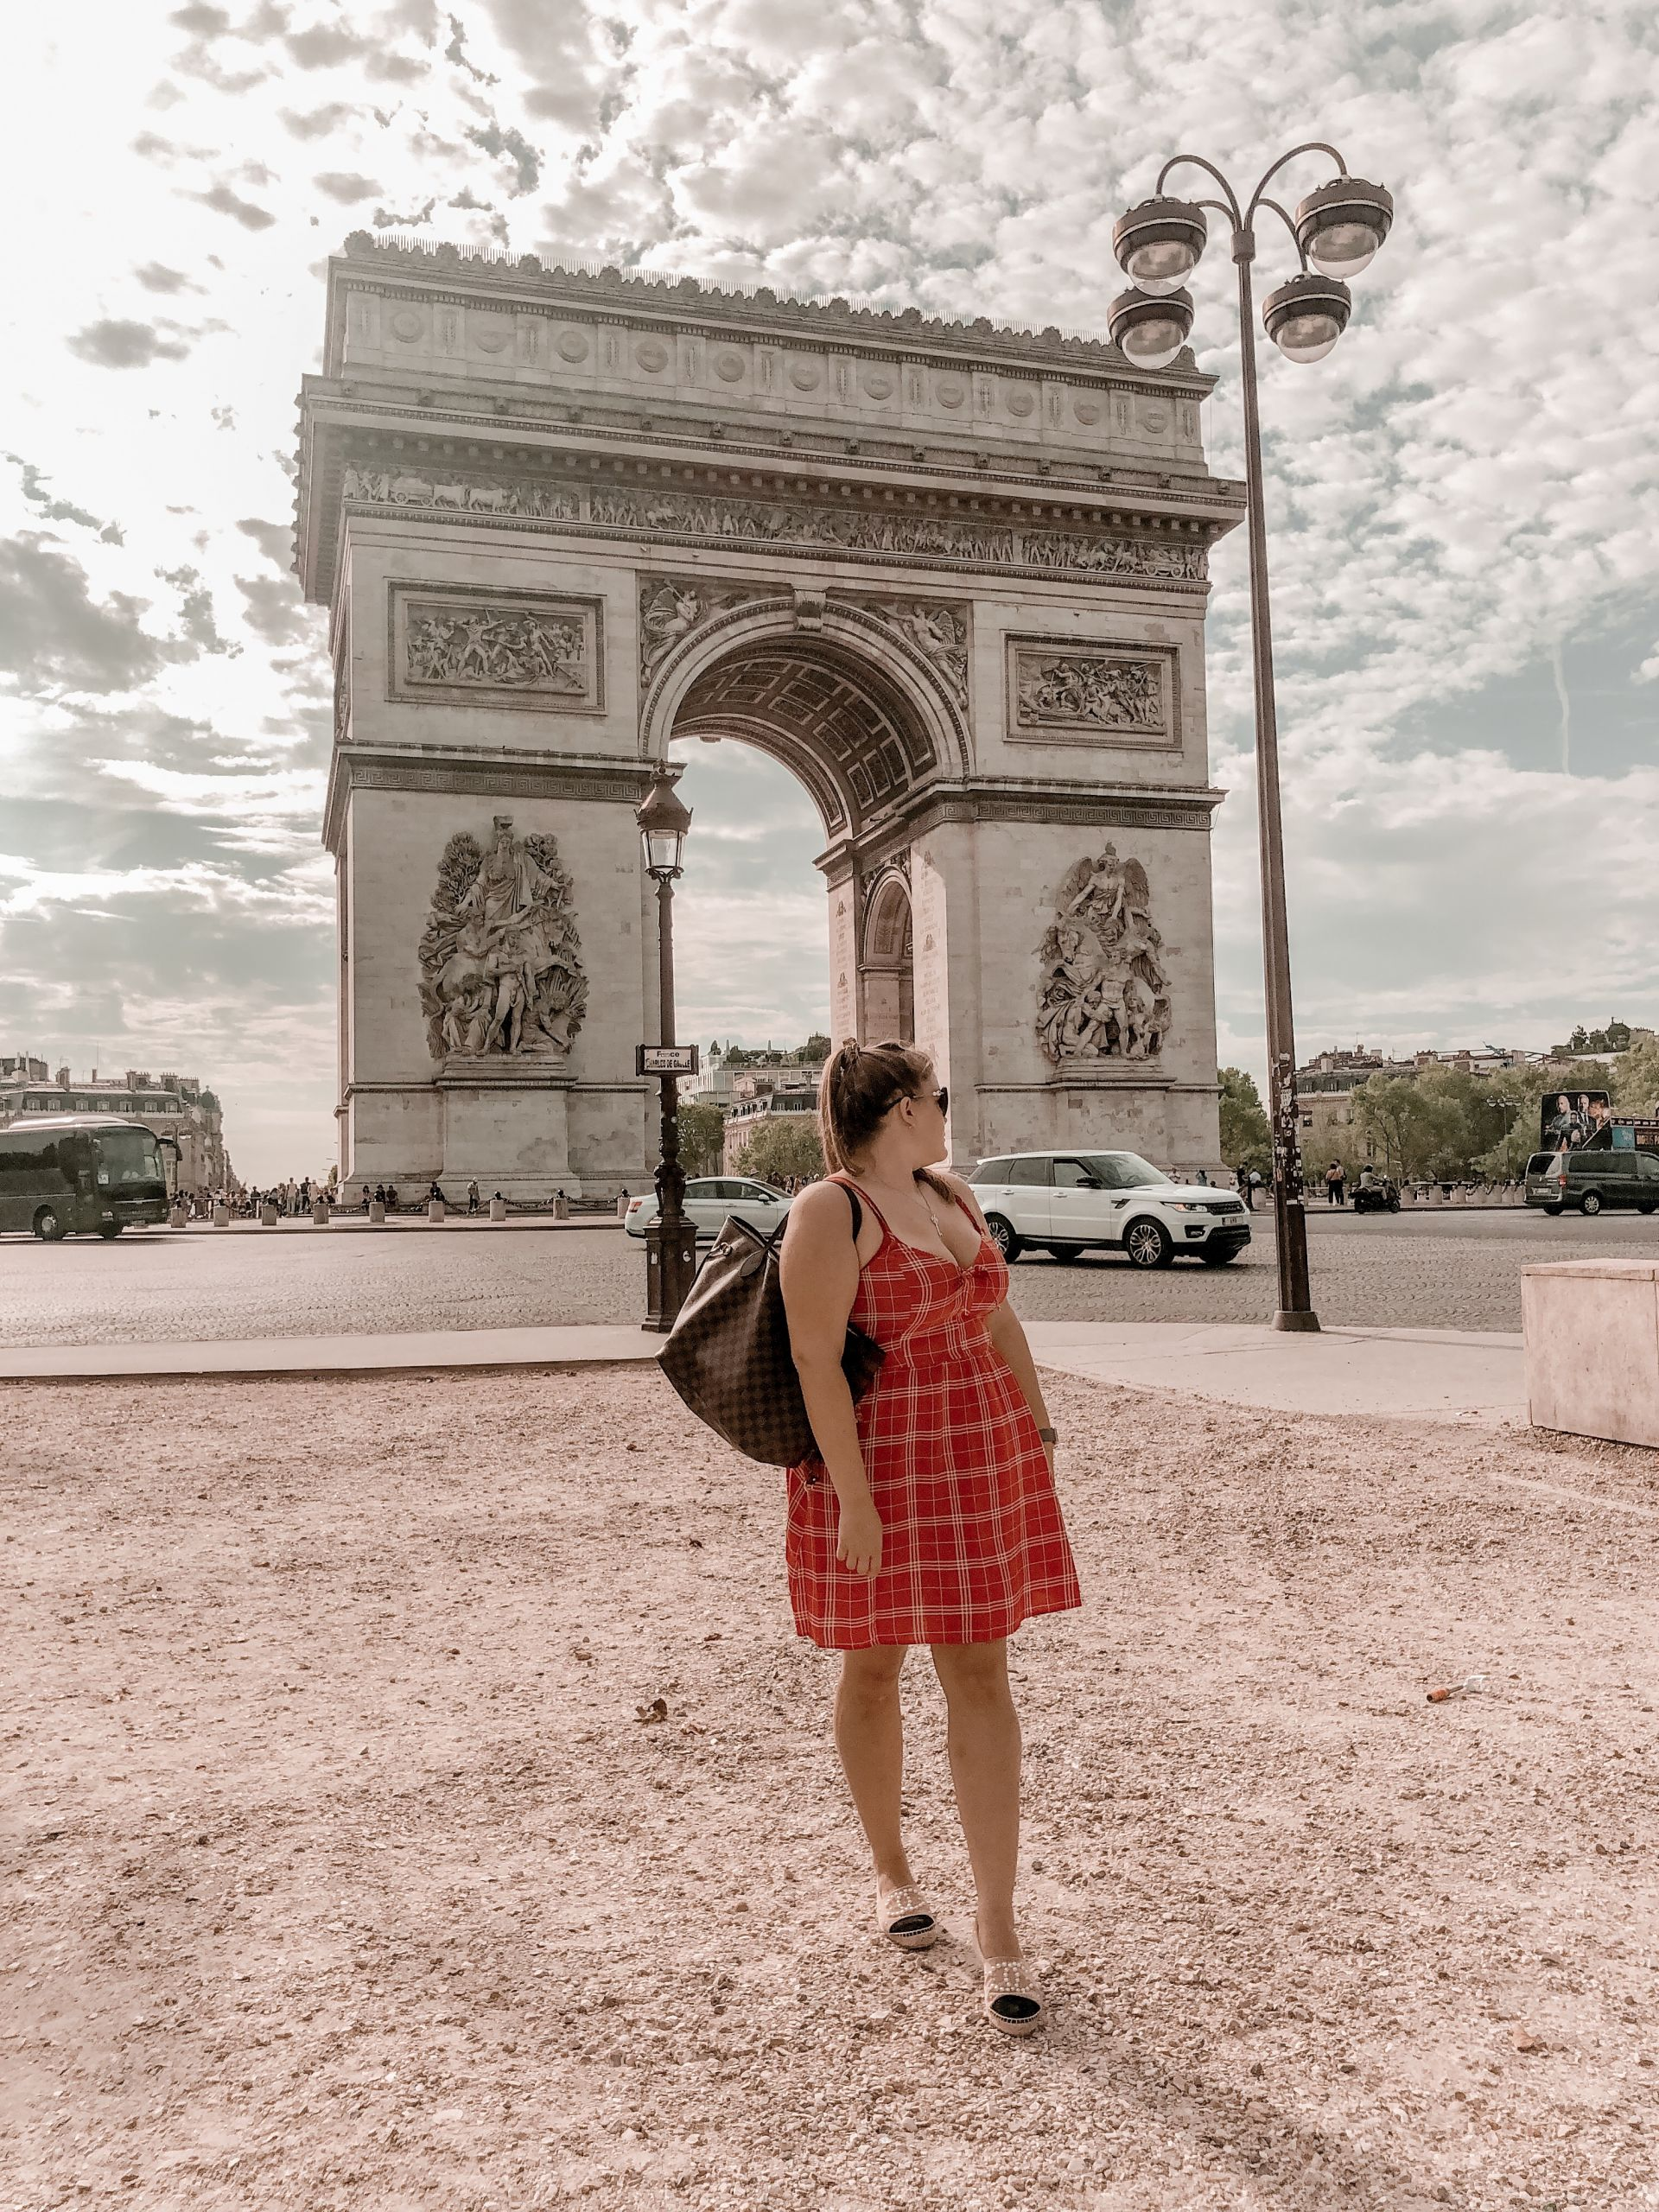 Triumphbogen-Kleid-Rot-Paris-travelguide